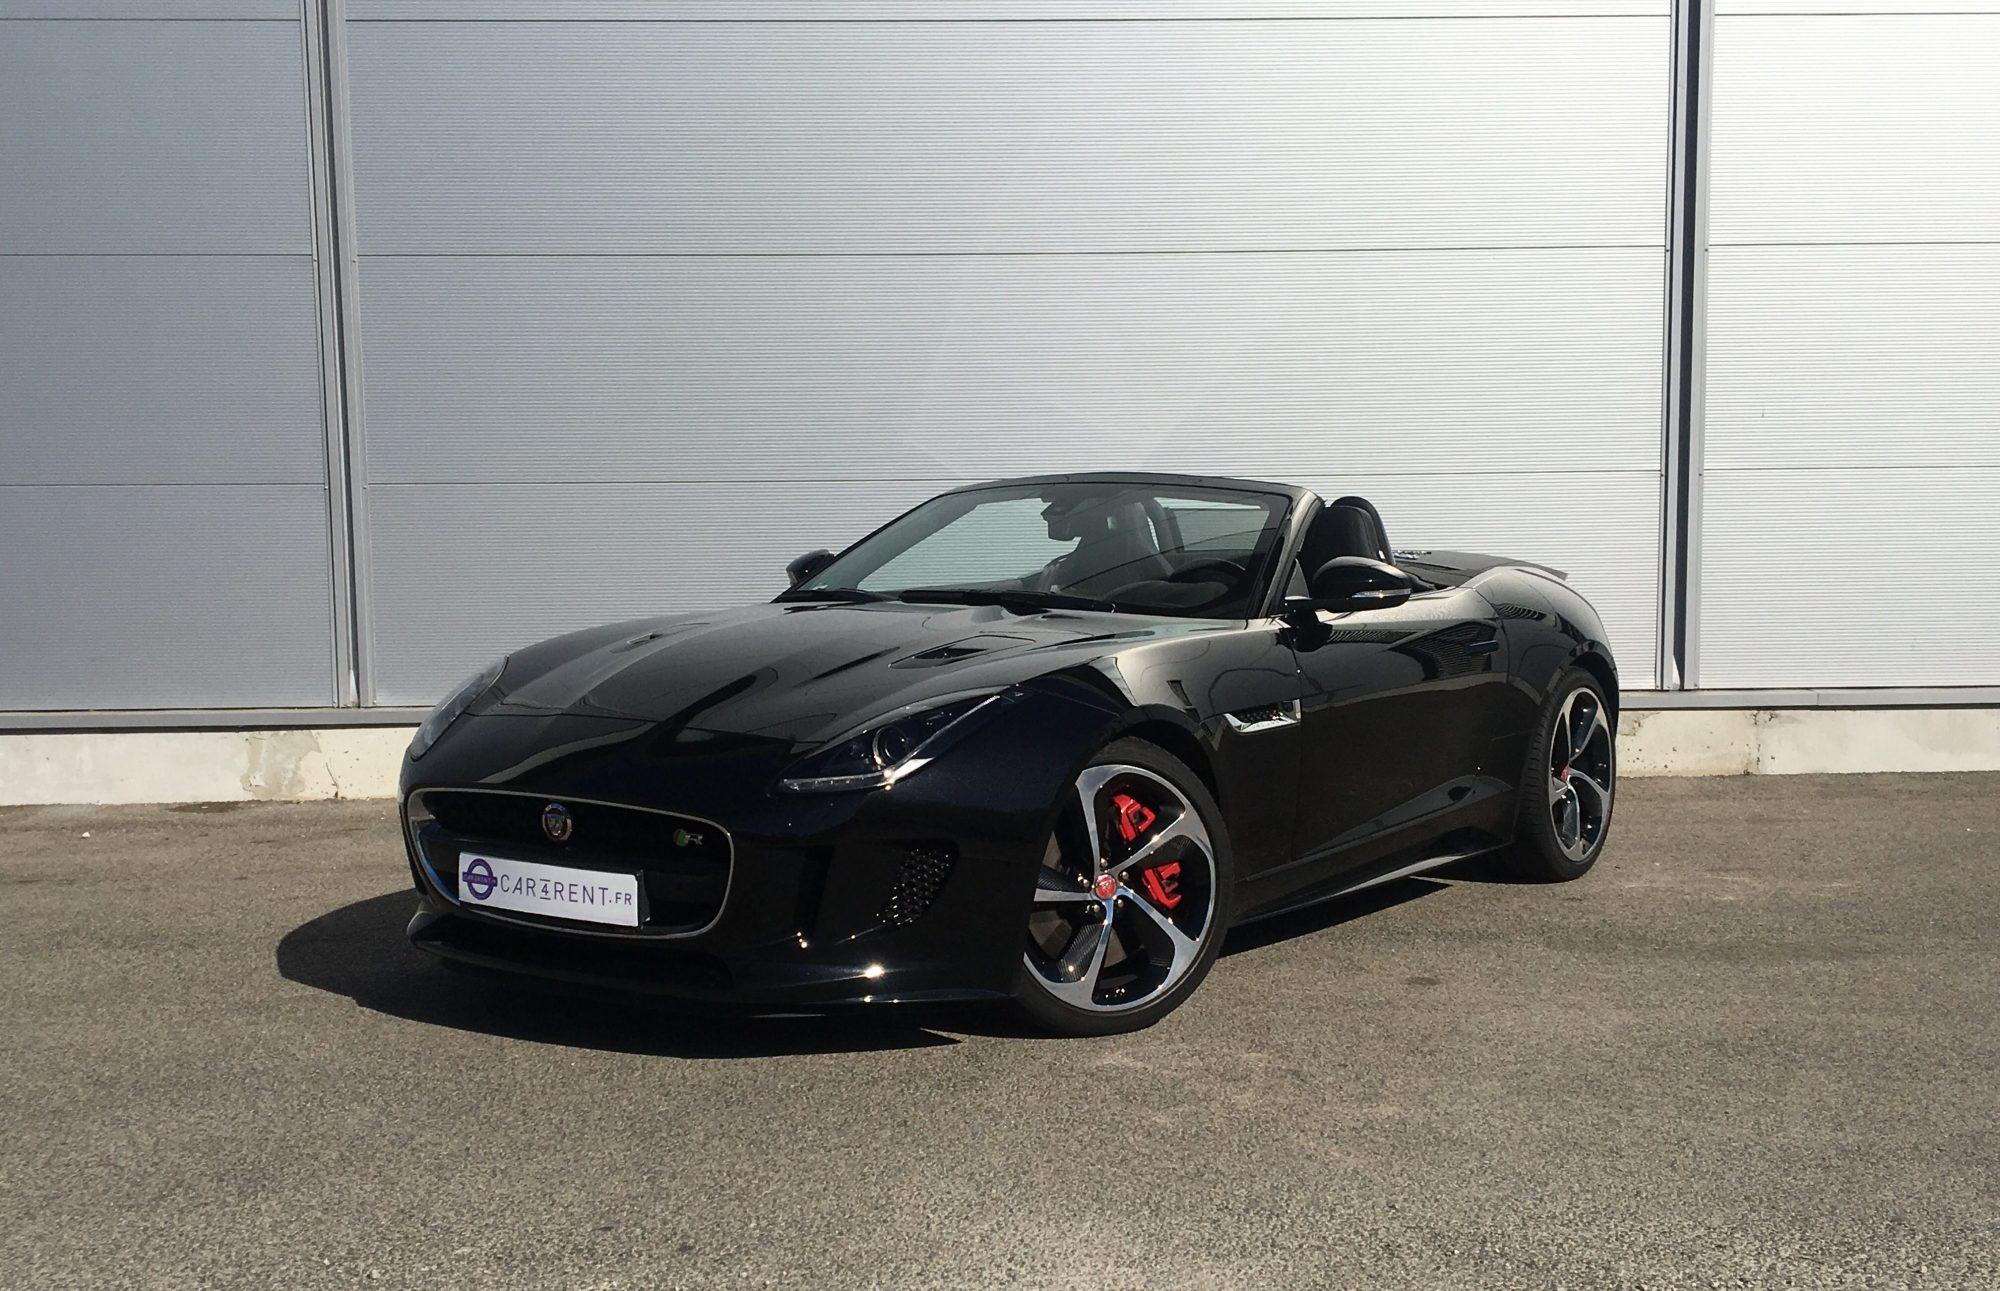 hight resolution of rent jaguar f type car4rent luxury car rental monaco